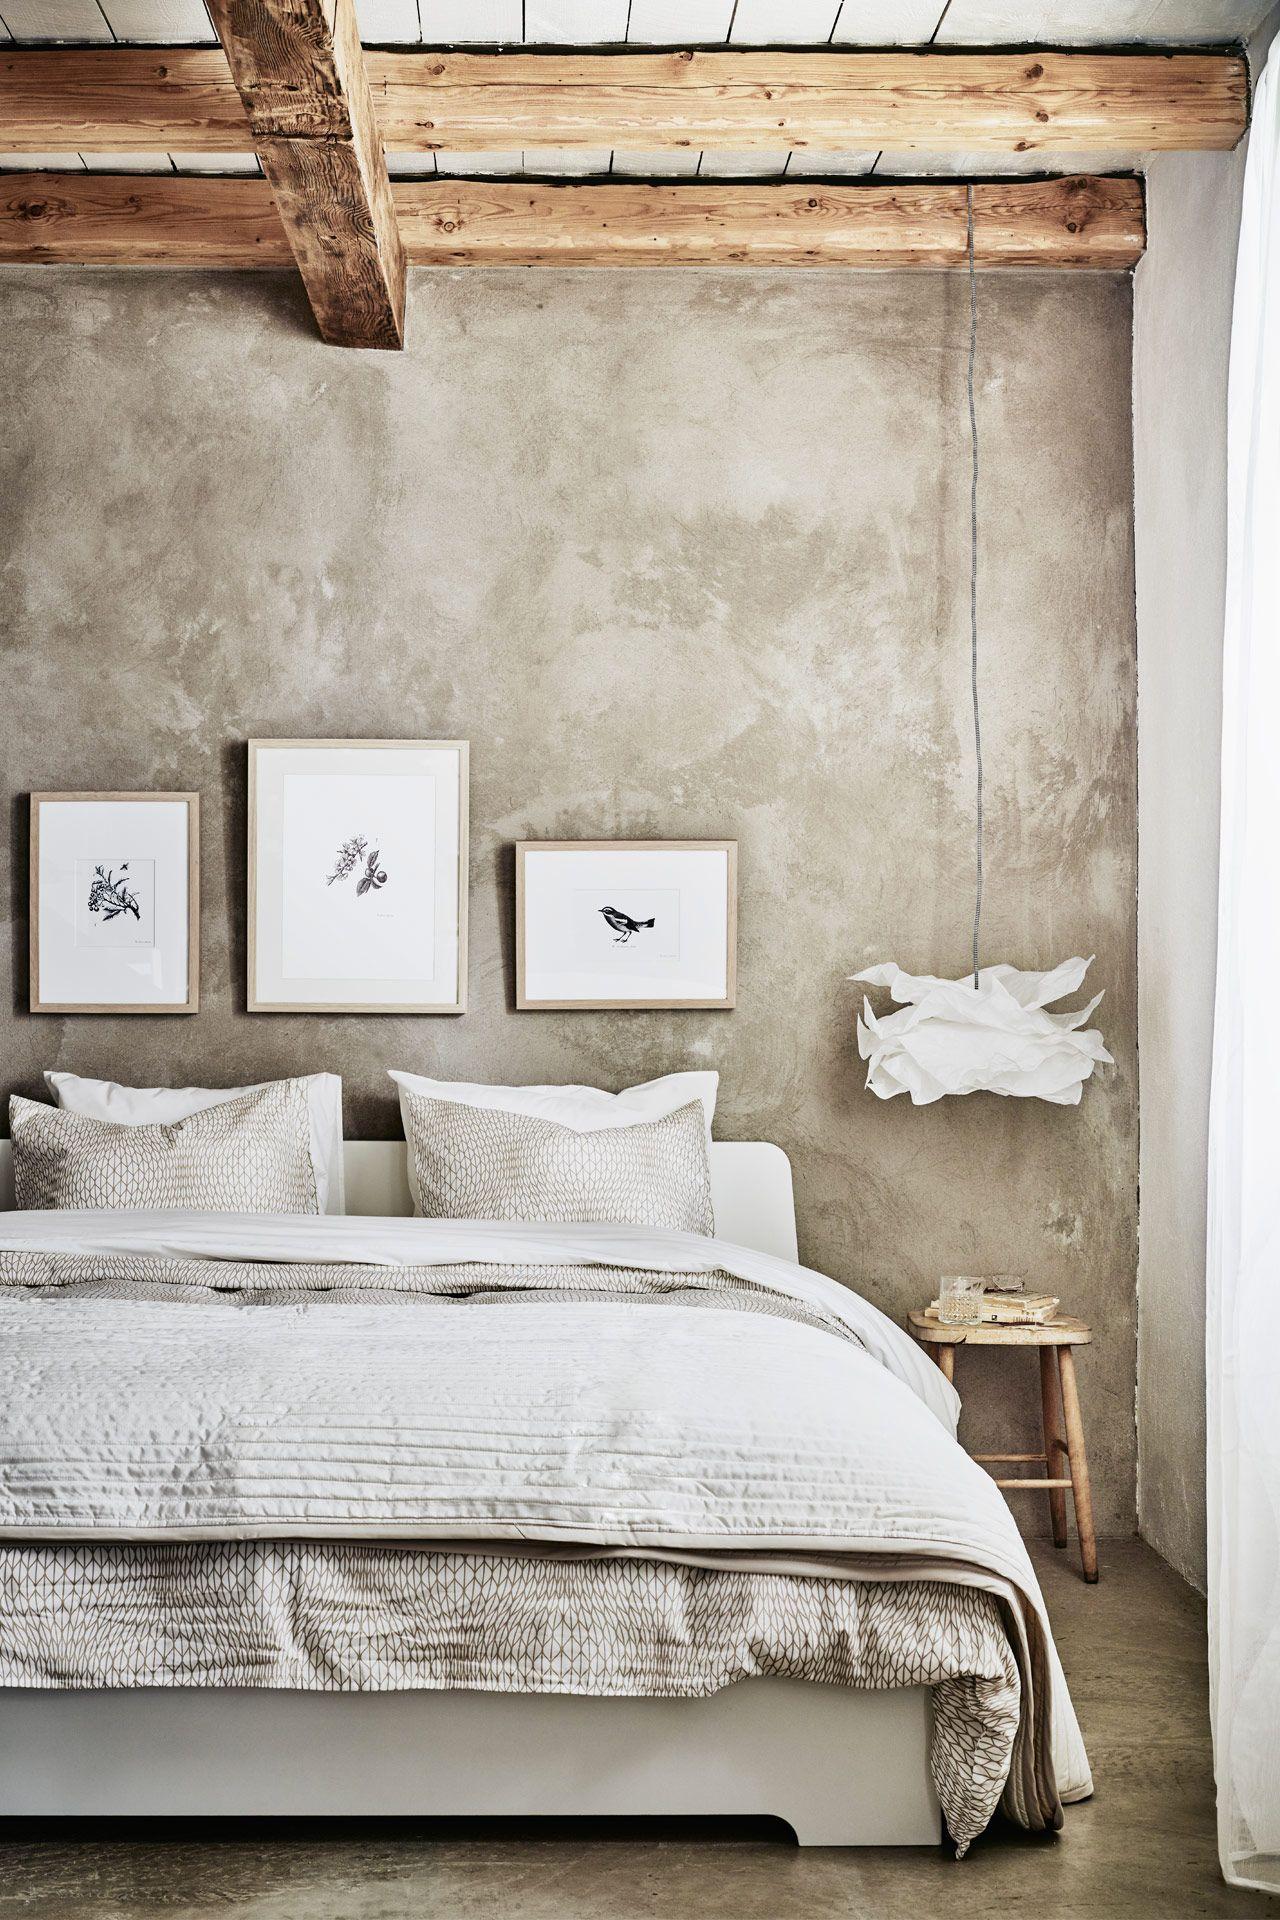 The Everyday Every Day The Path To Sweet Dreams Found It Featured Decoracao Ikea Decoracao De Quarto Quarto De Casal